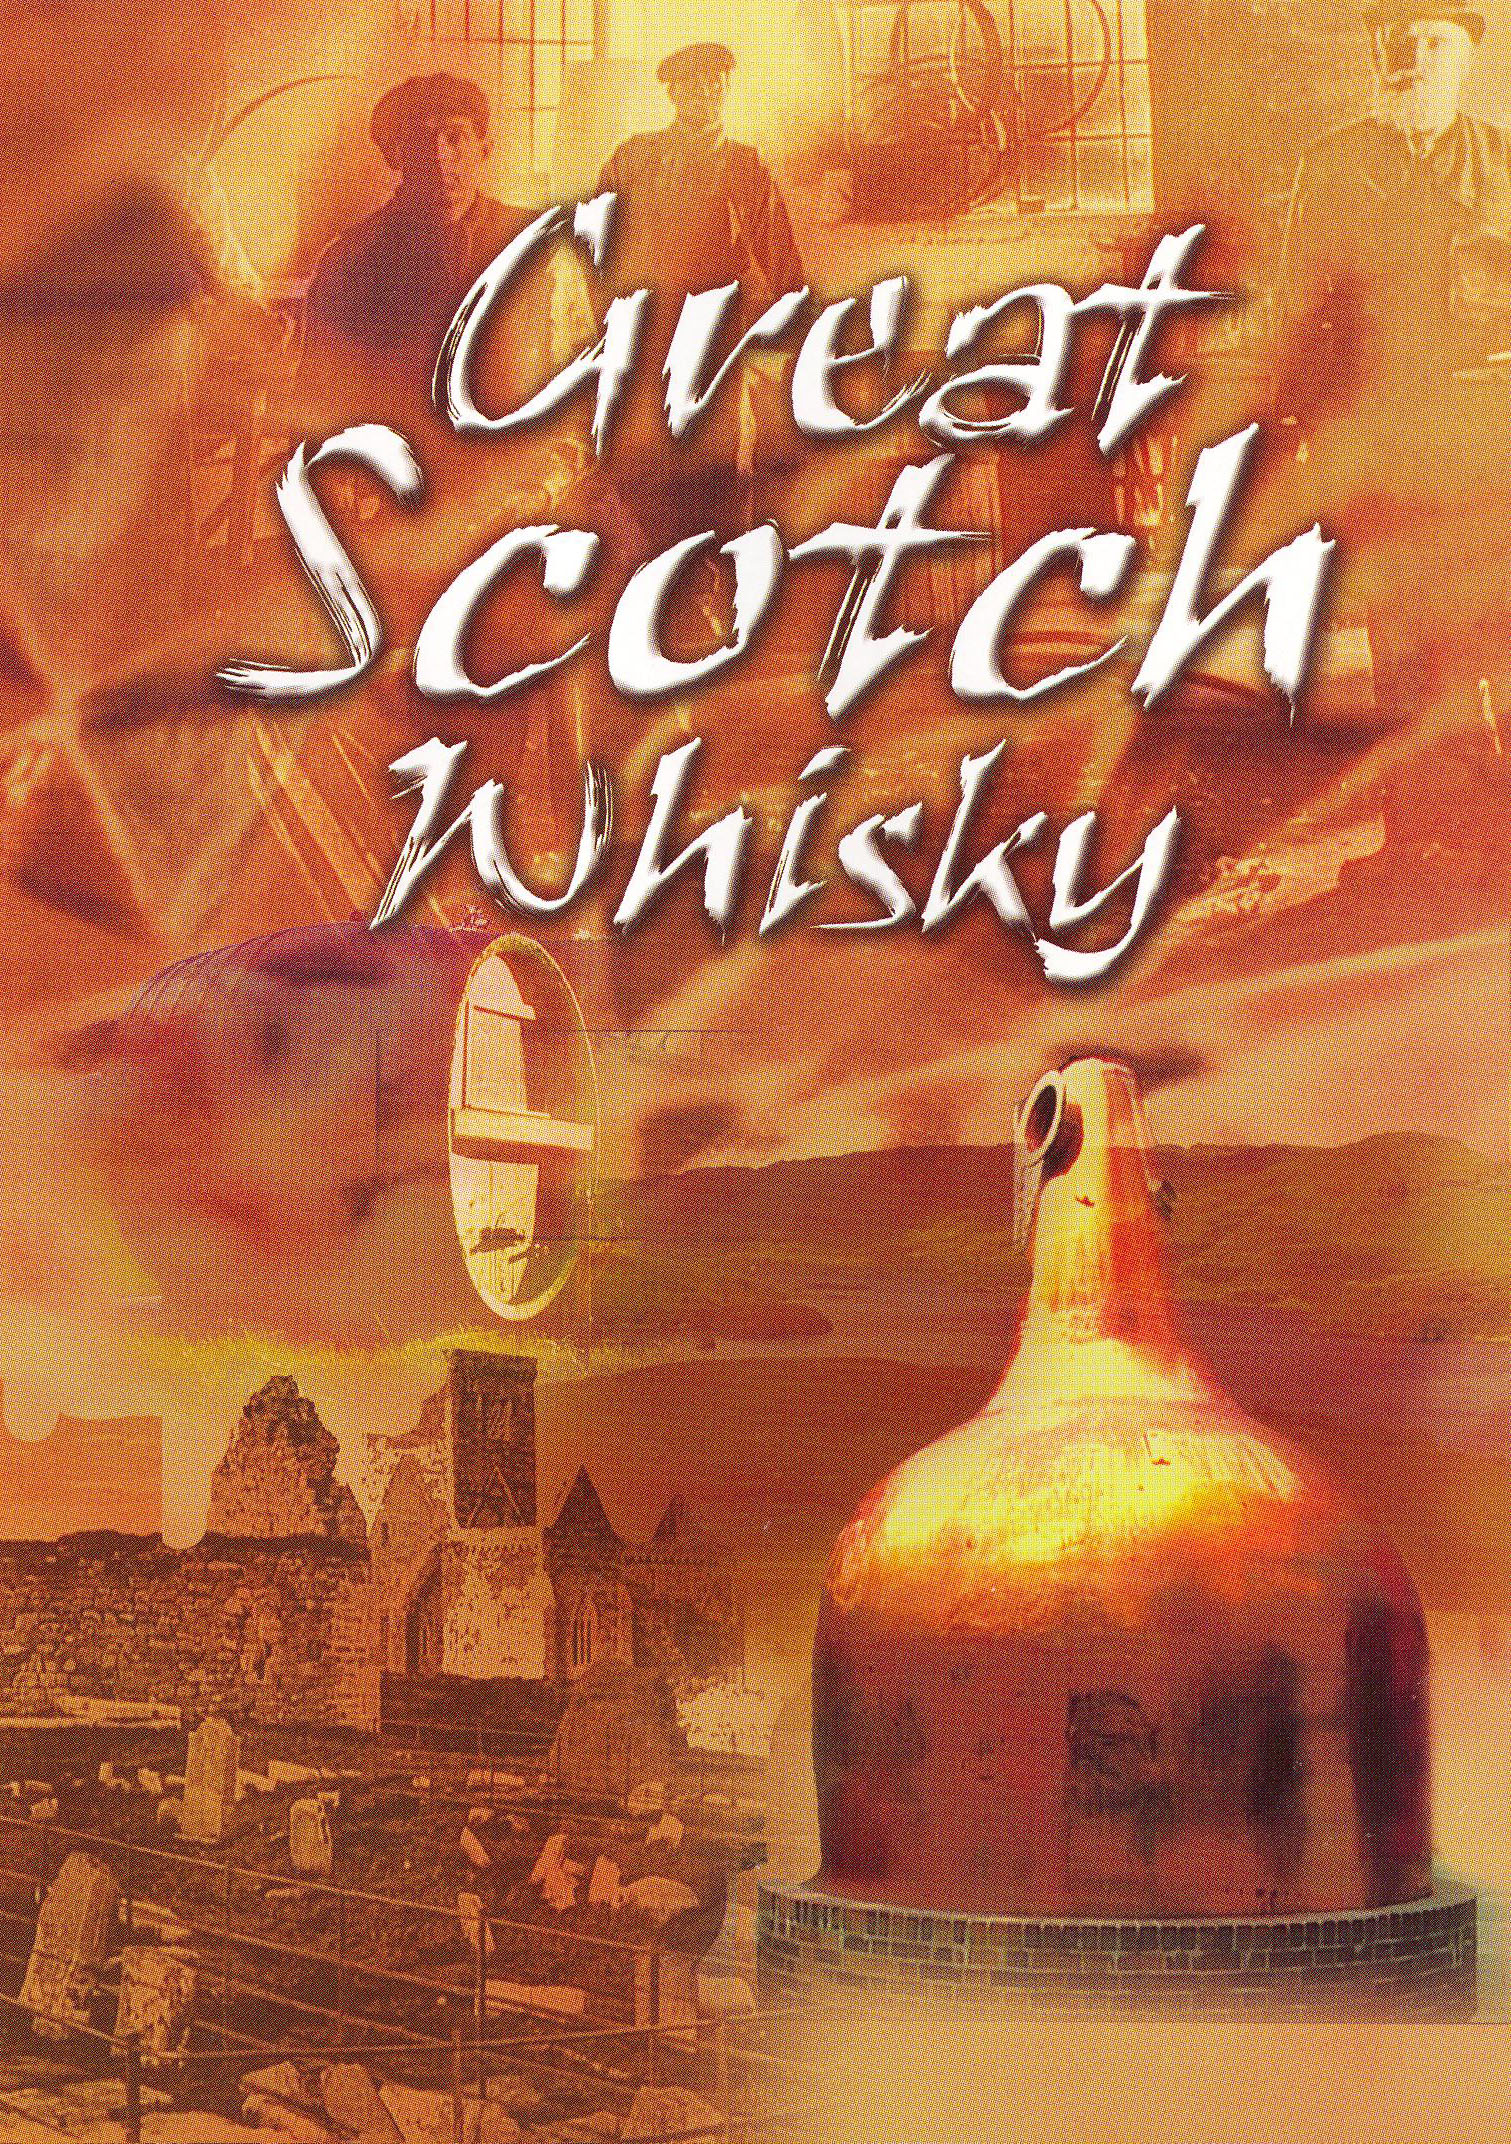 Great Scotch Whiskey